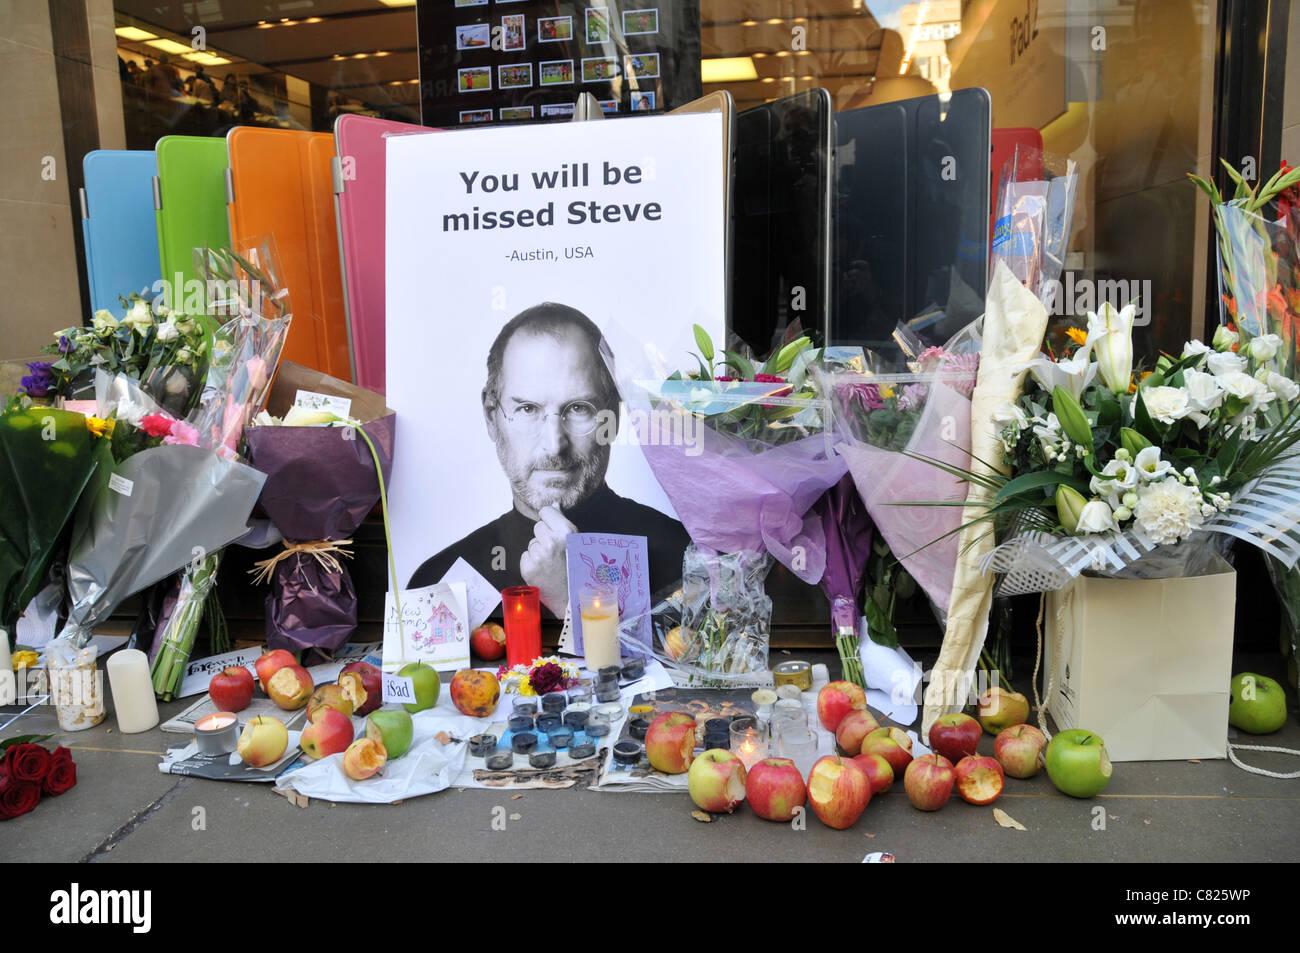 Find A Grave Steve Jobs: Steve Jobs Death Memorial Shrine Apple Store Flowers